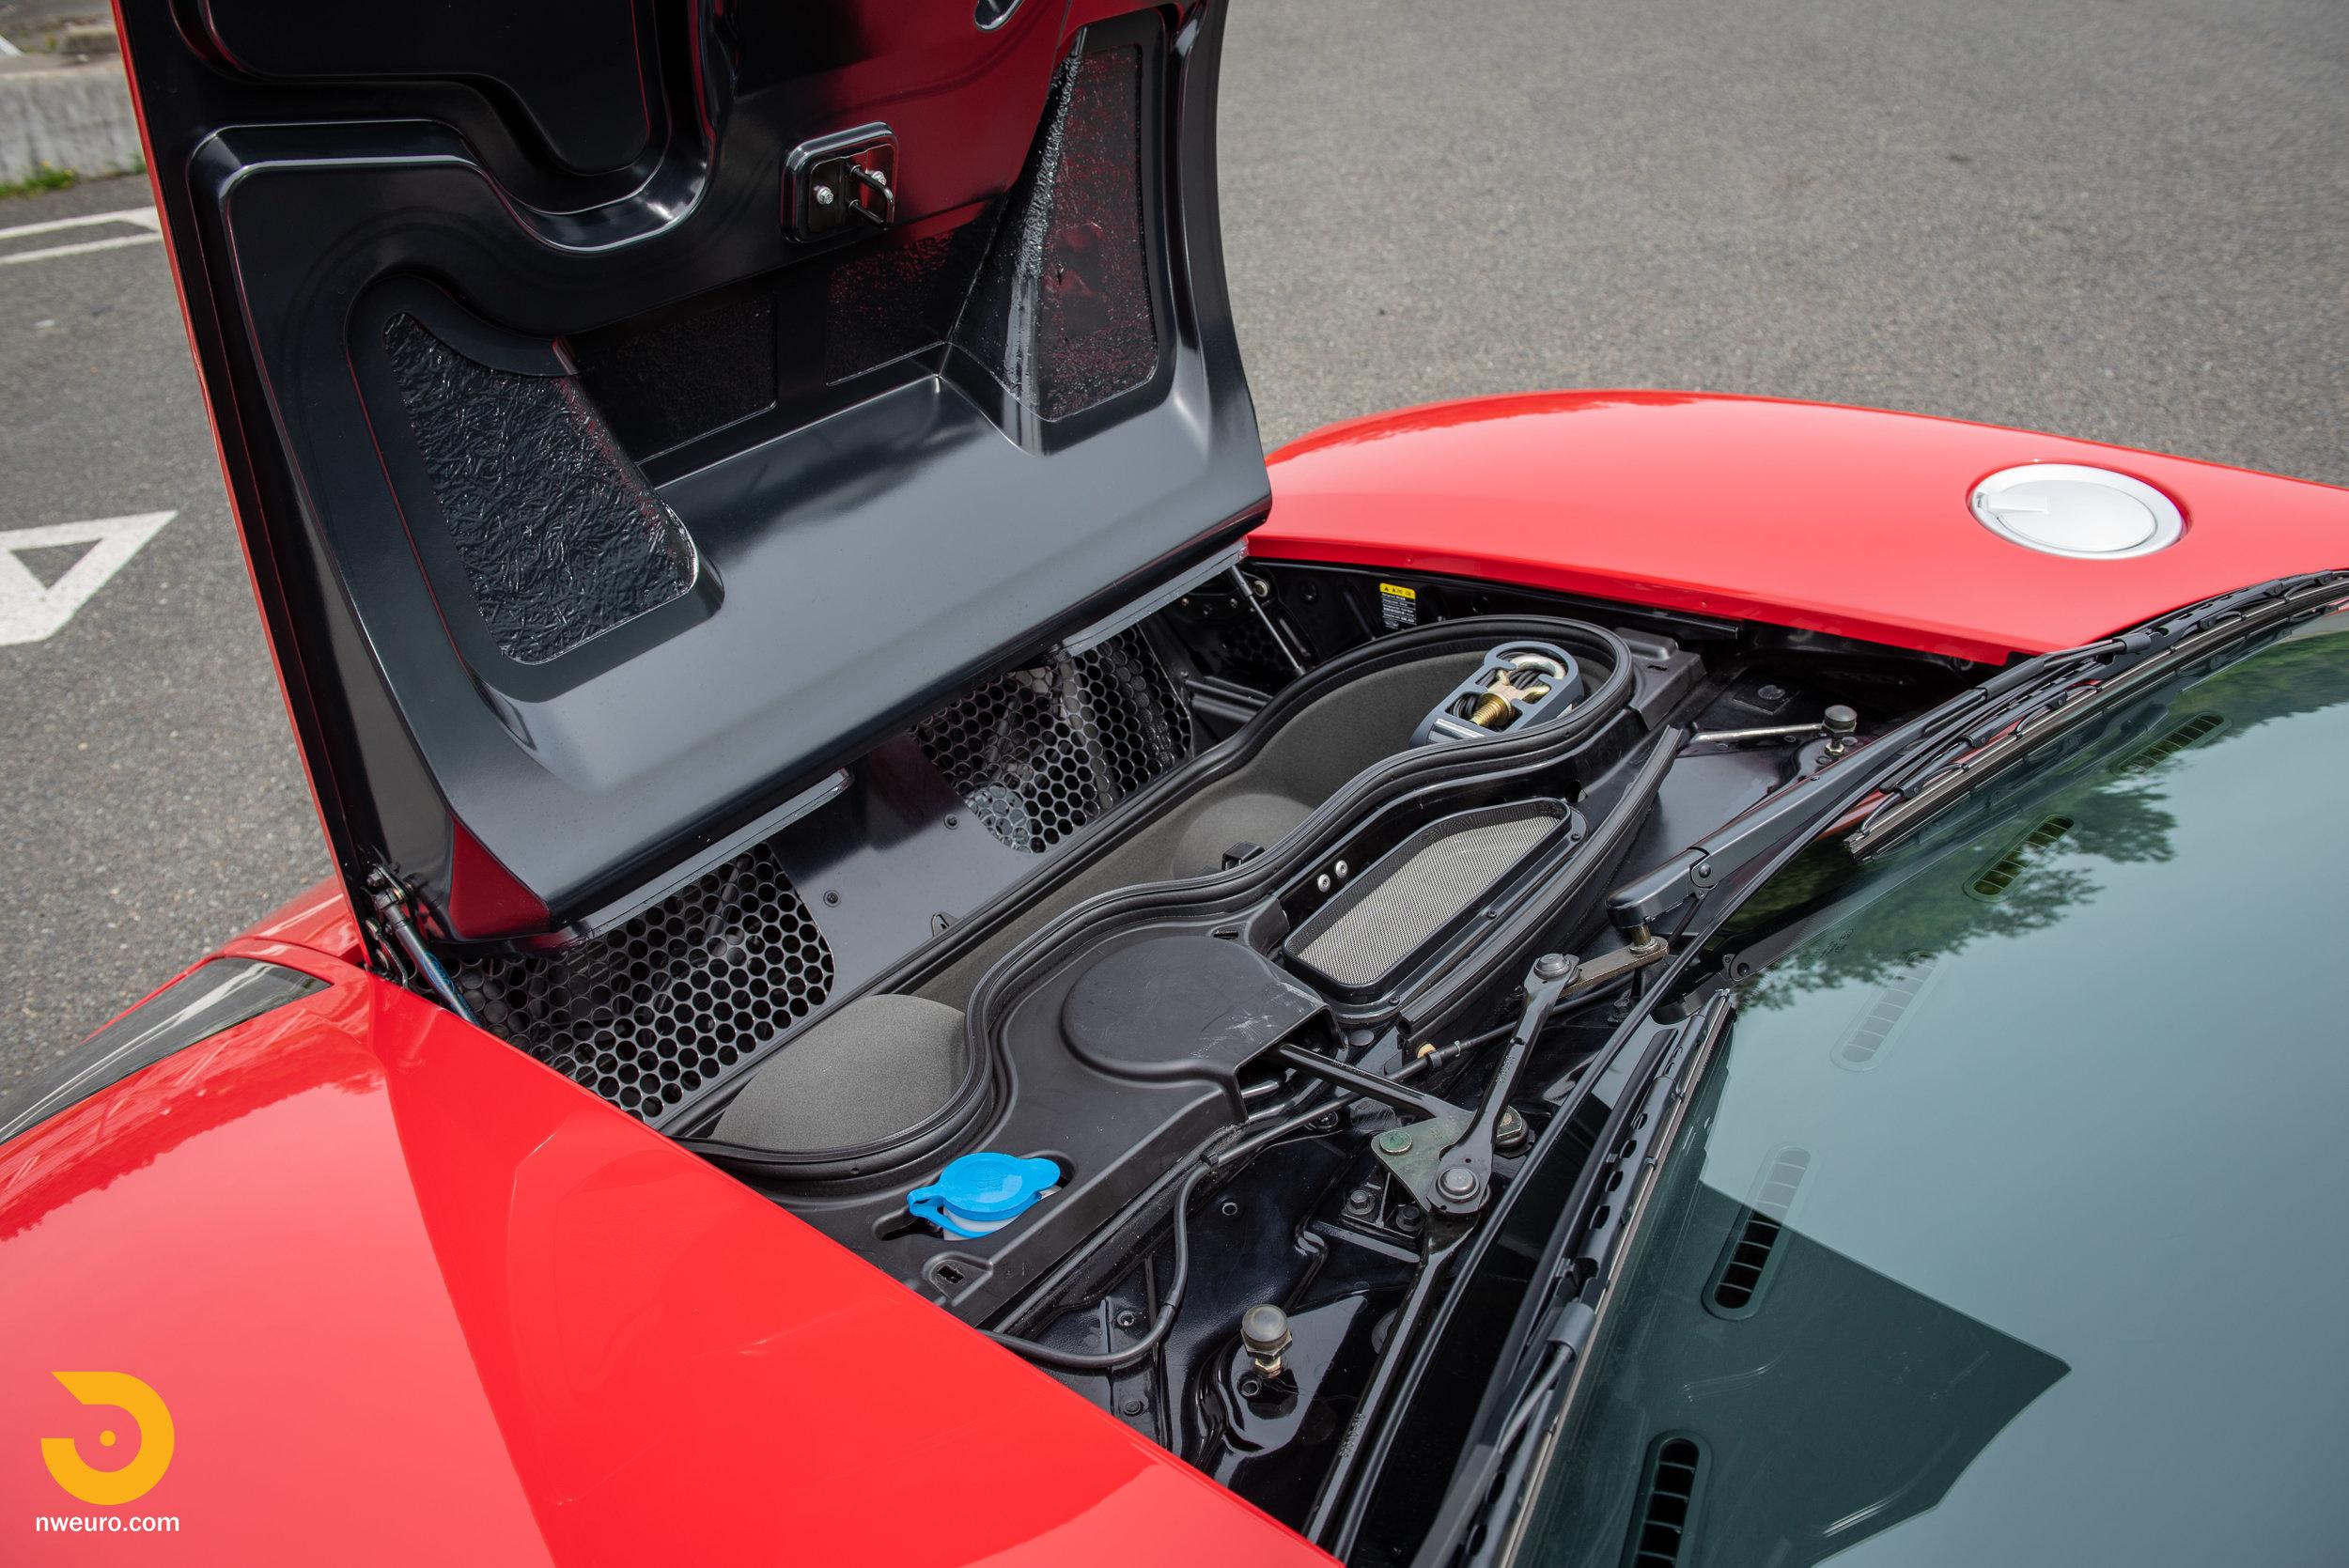 2005 Ford GT Red-13.jpg